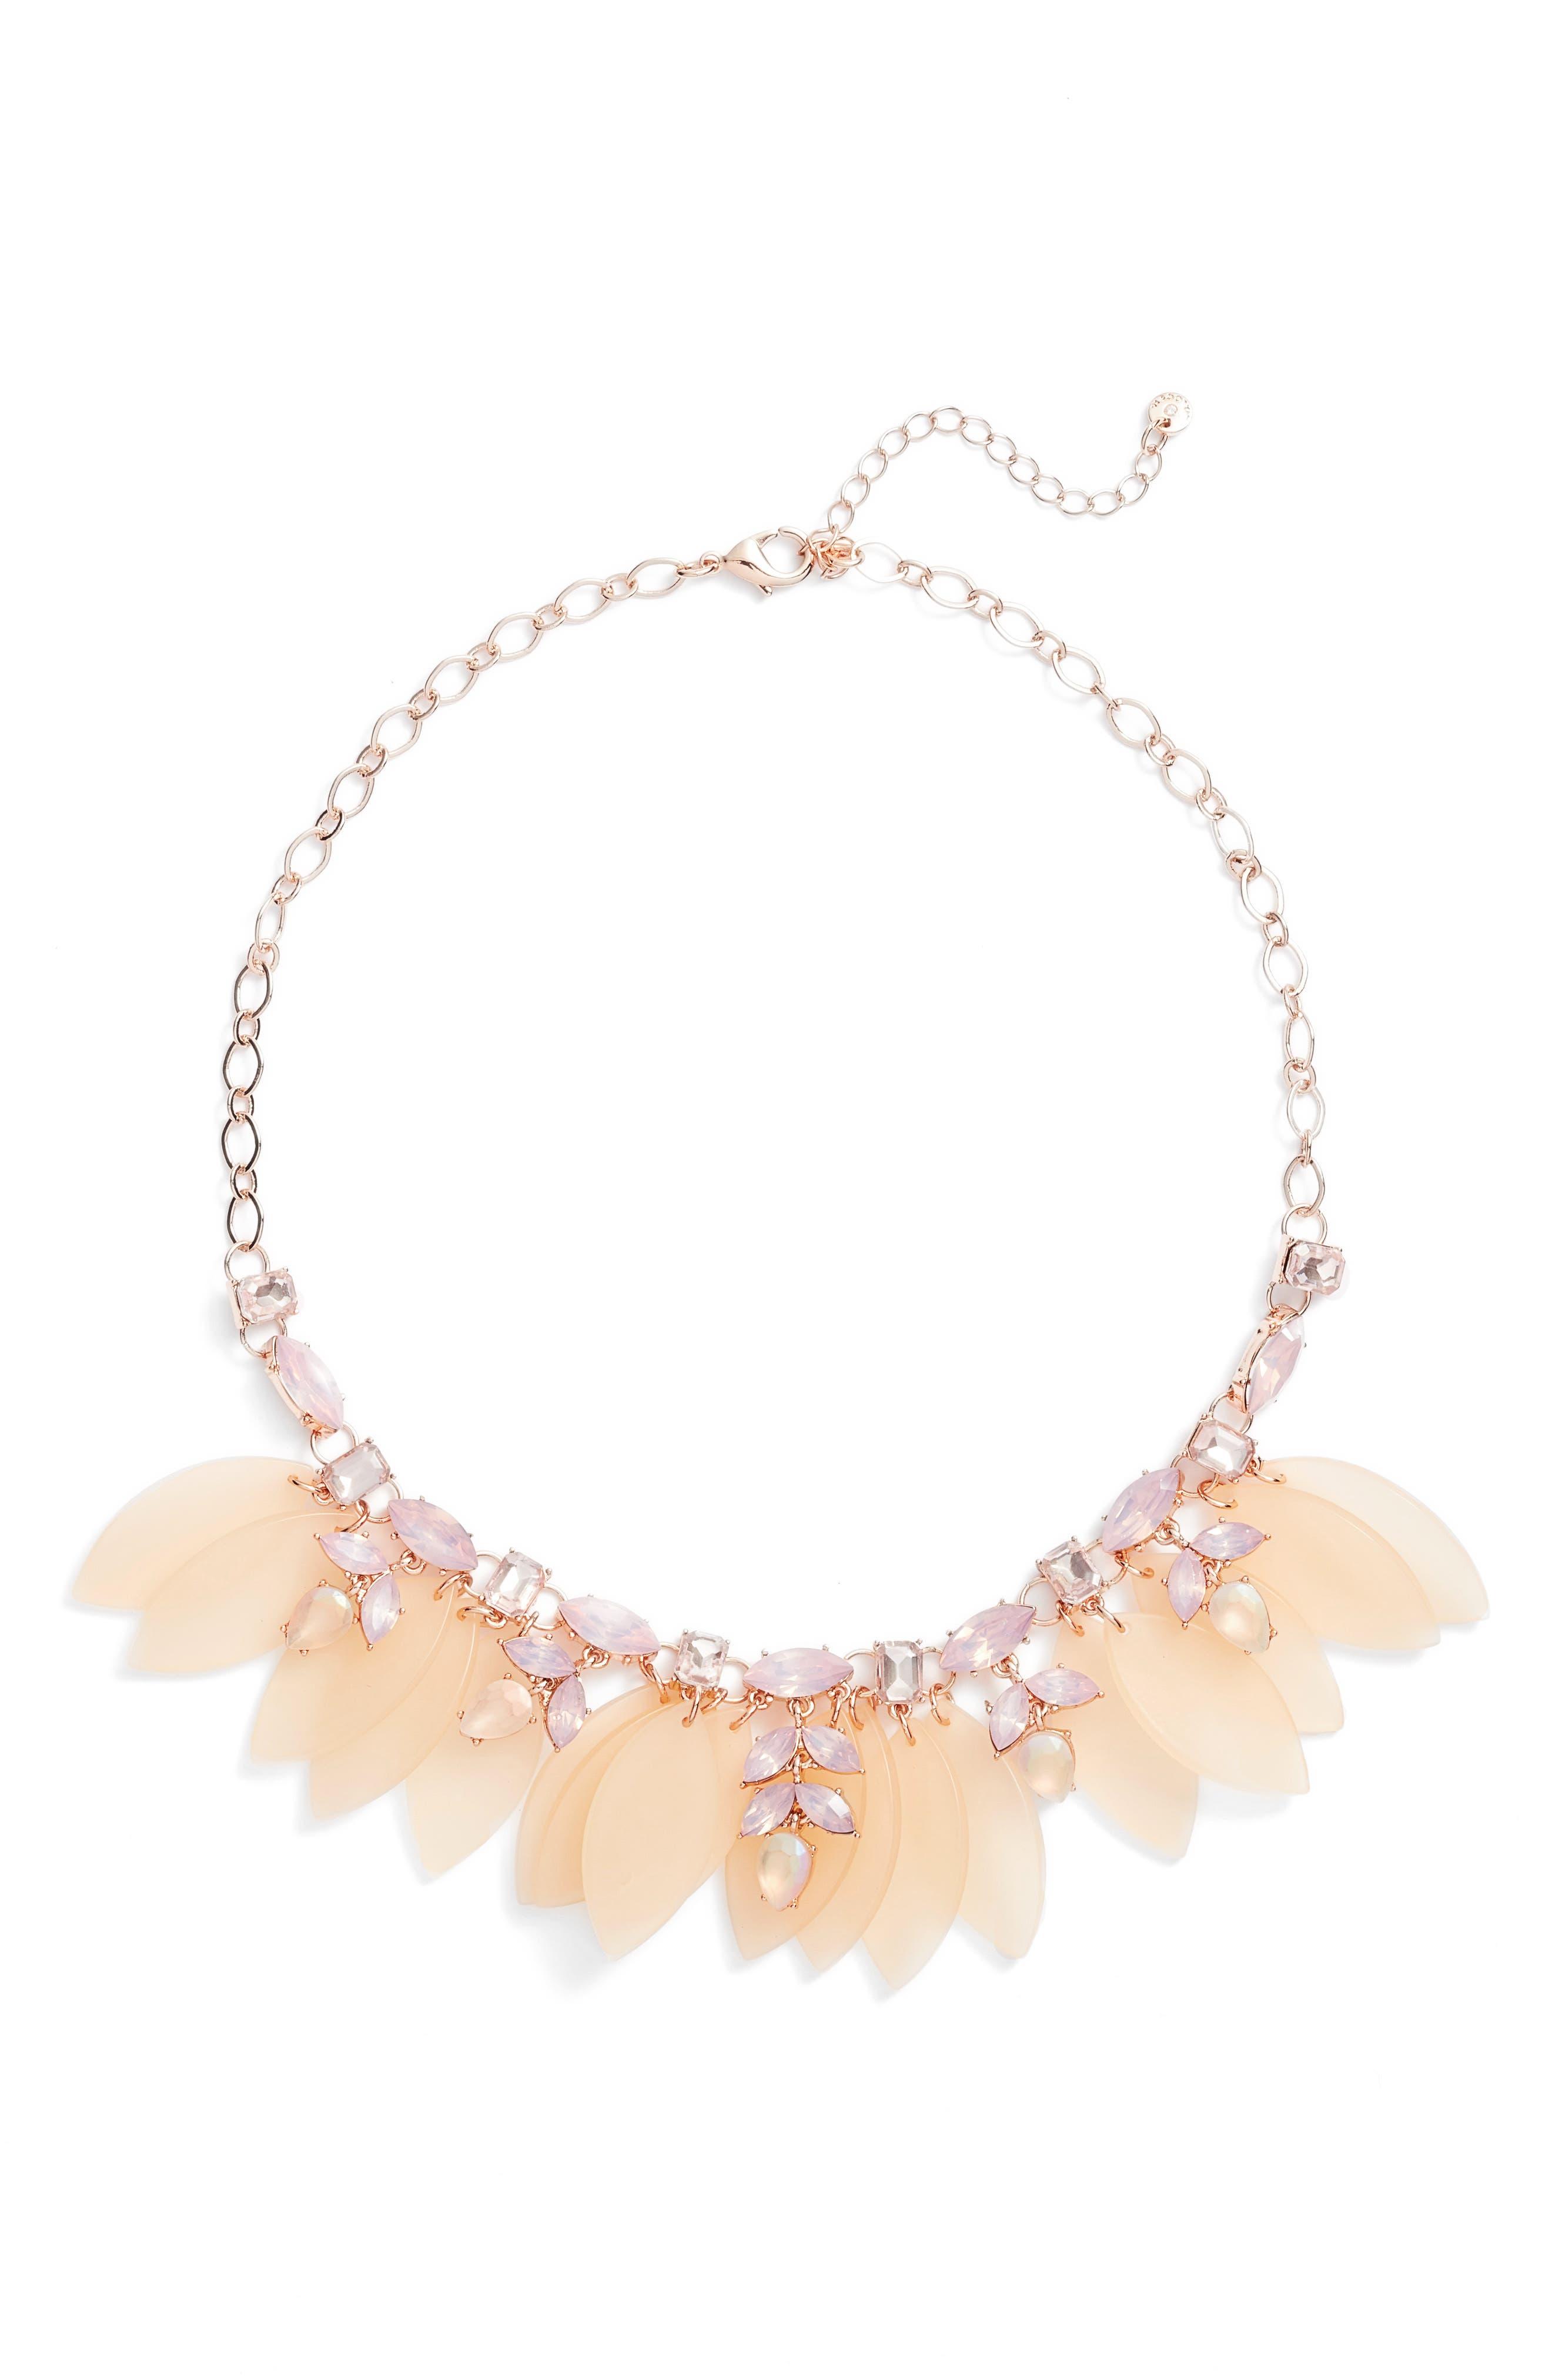 Petal & Stone Collar Necklace,                             Main thumbnail 1, color,                             Pink Multi- Rose Gold